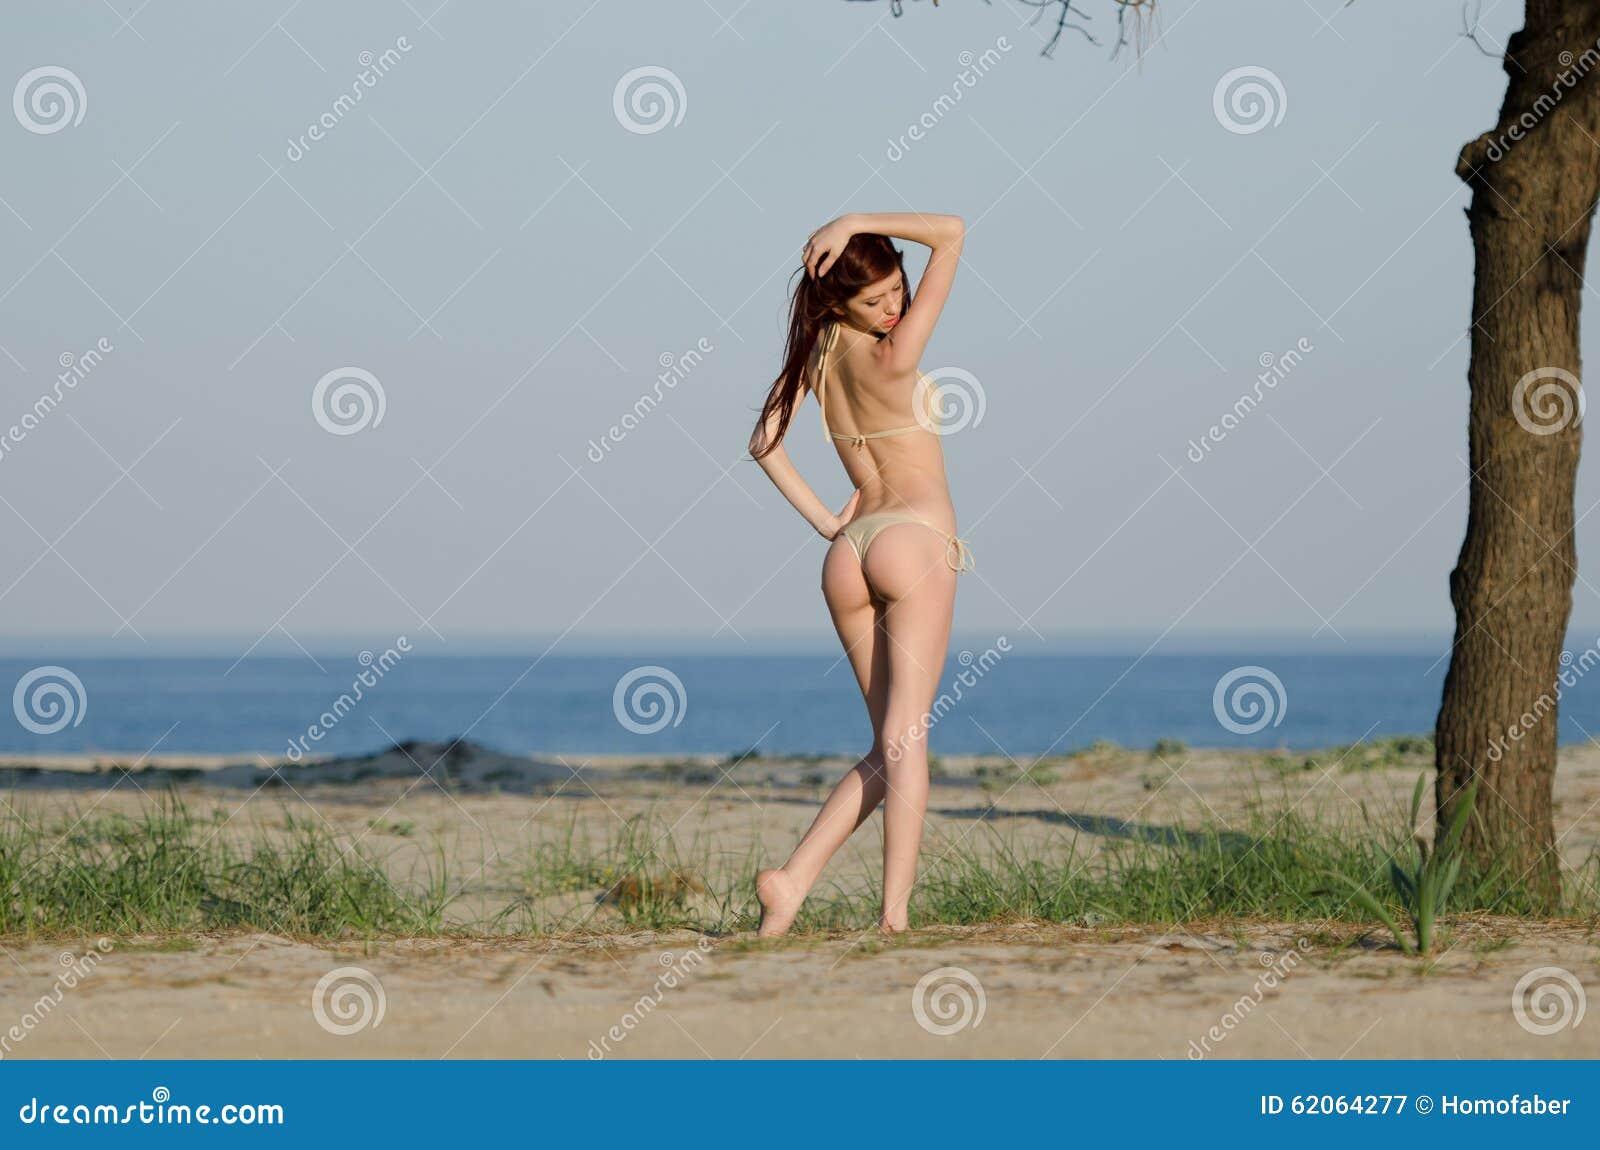 young red hair woman wearing coverall bikini